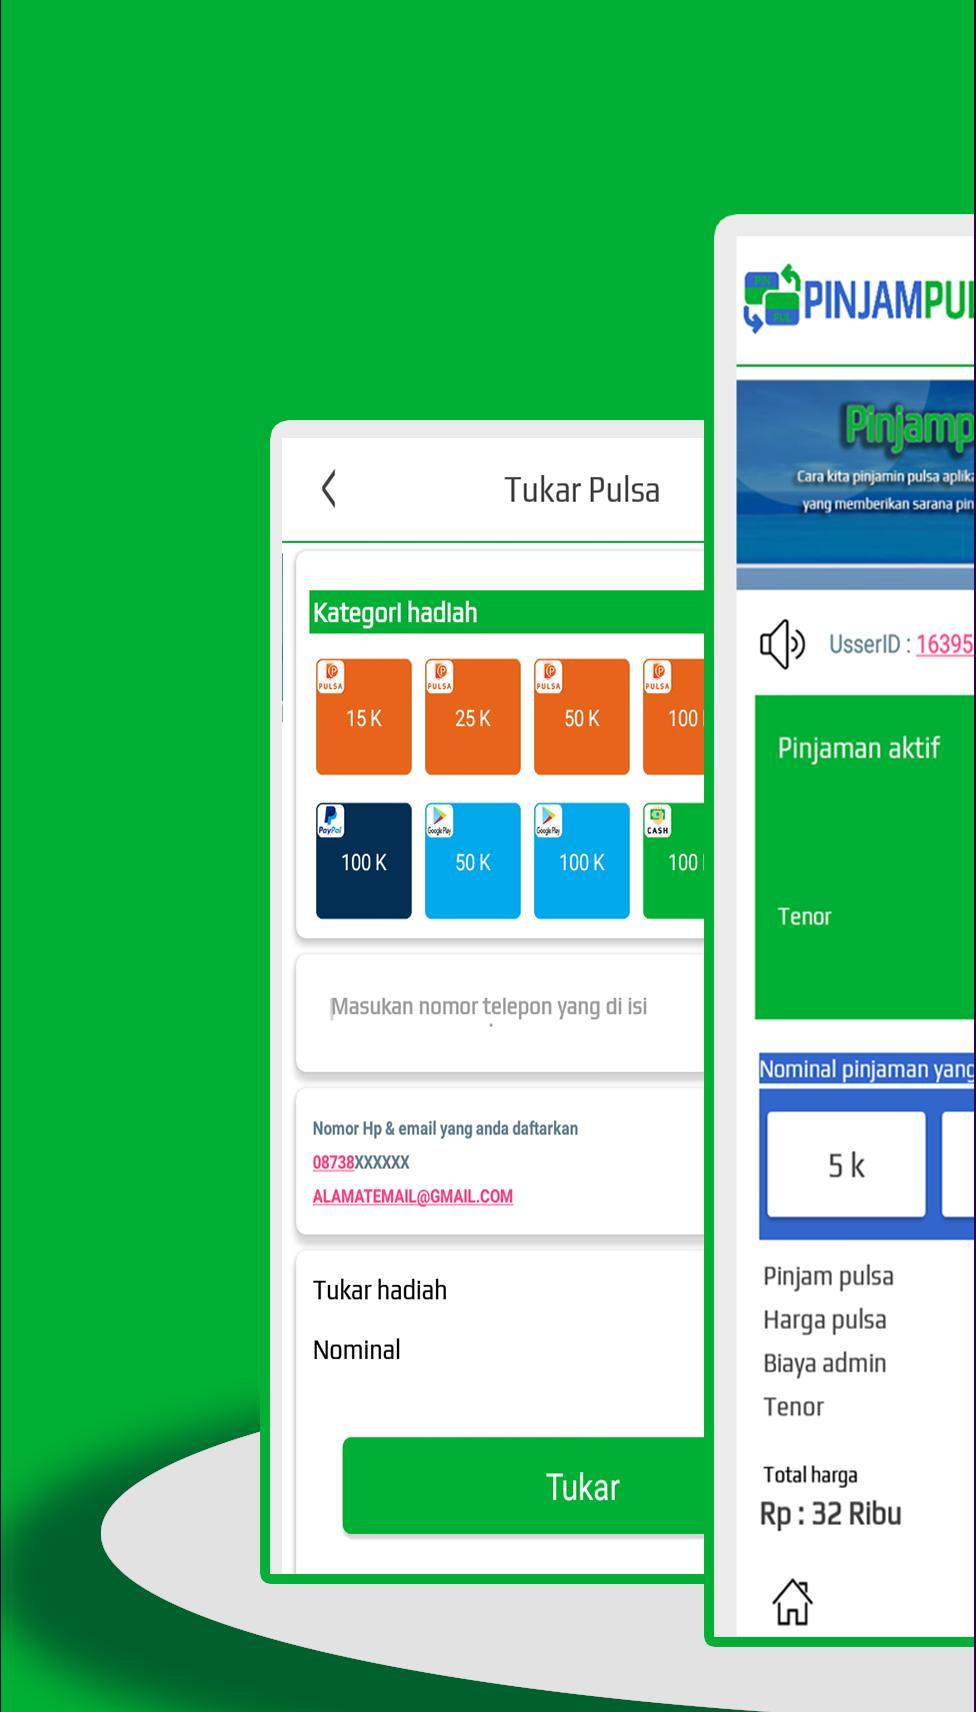 Pinjam Pulsa Online For Android Apk Download